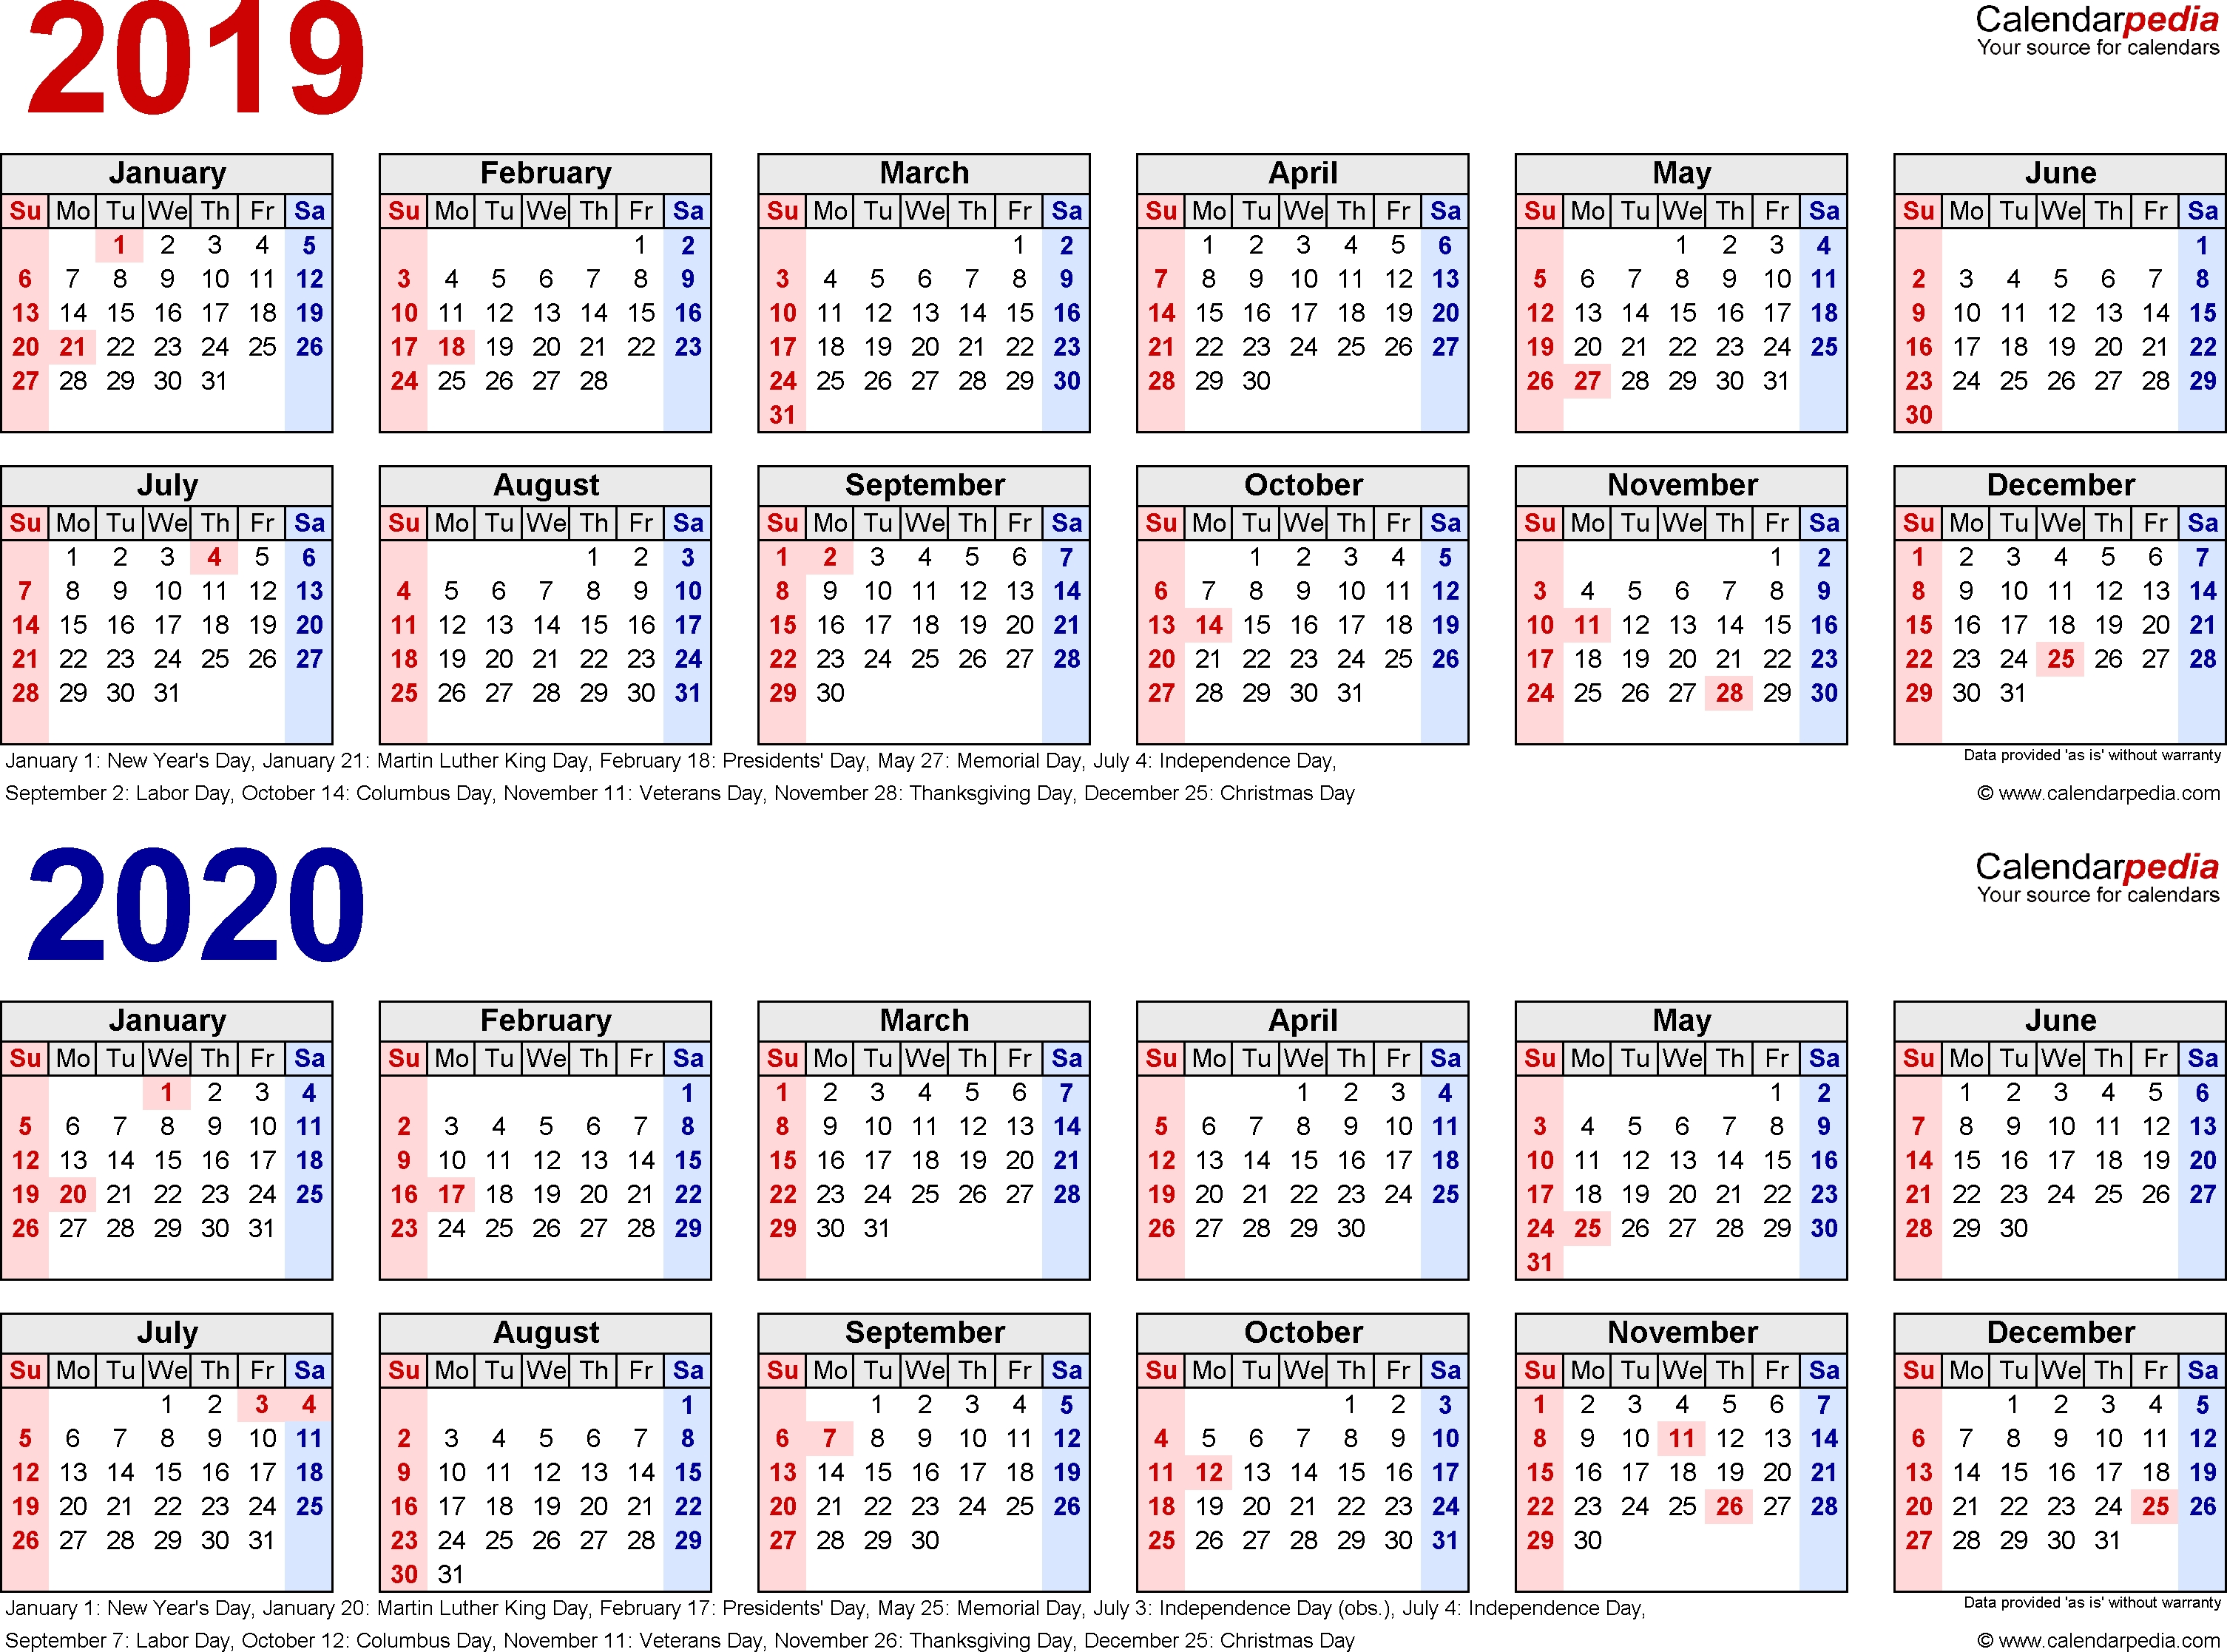 2019-2020 Calendar - Free Printable Two-Year Pdf Calendars within 2019 2020 2021 Printable Calendar Free